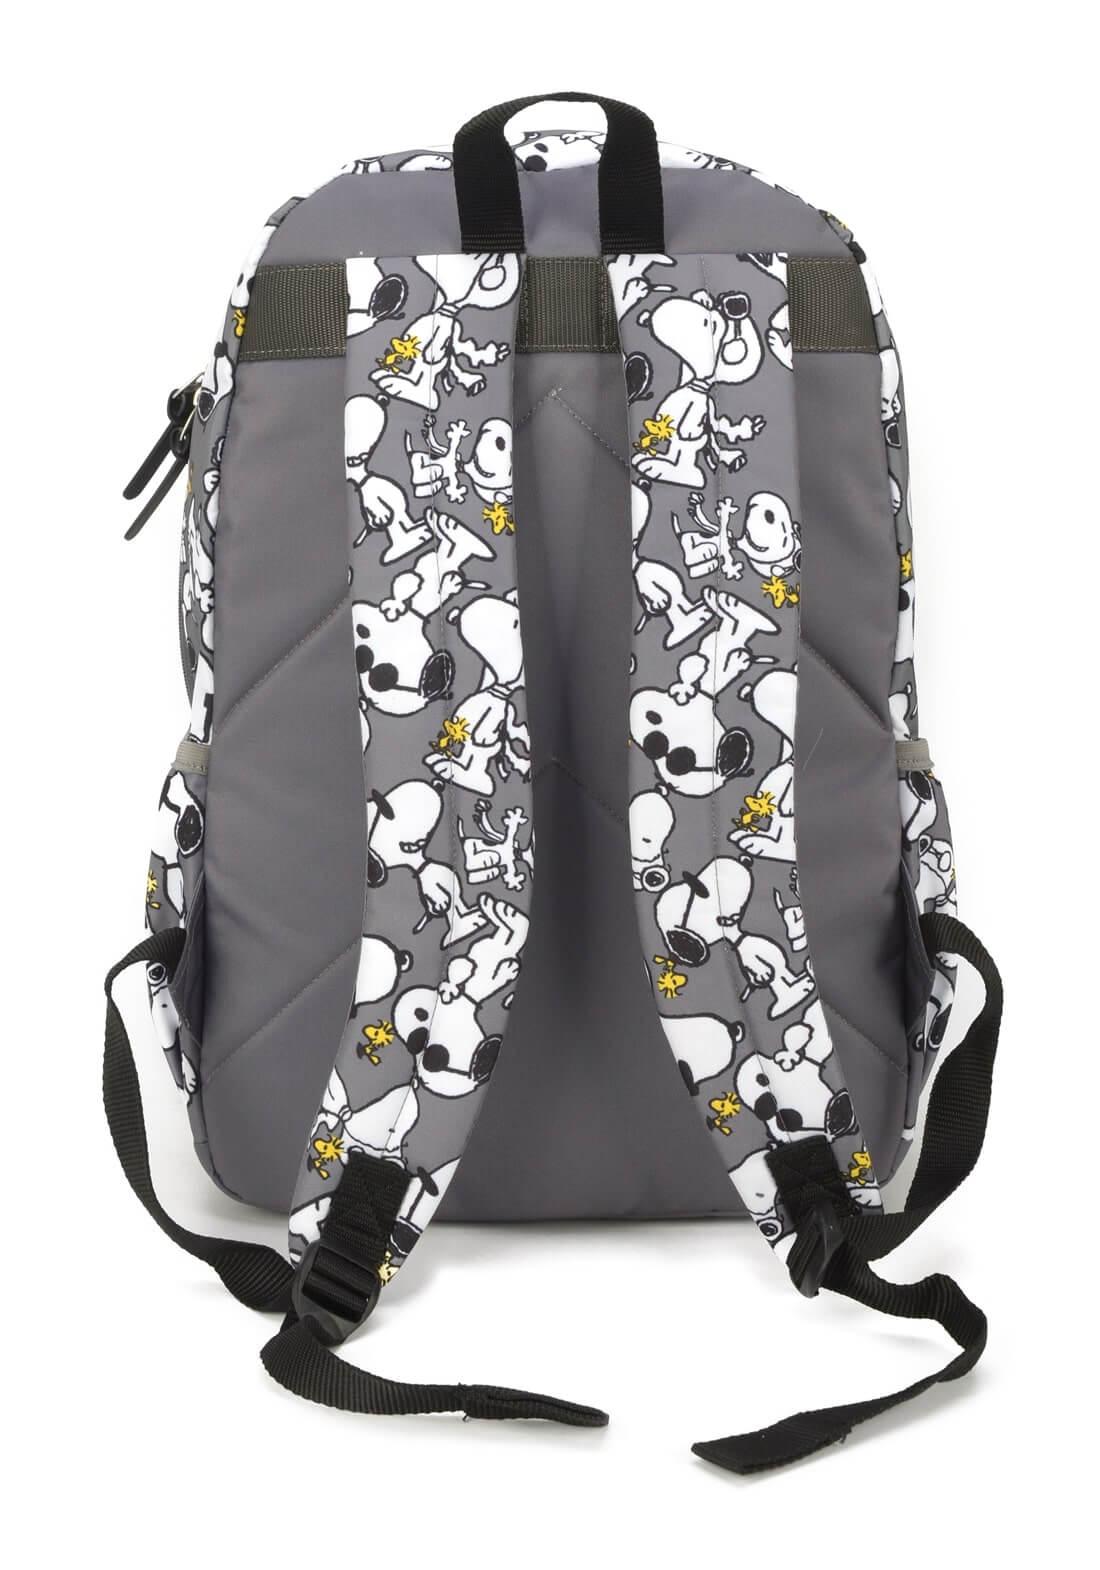 Mochila Notebook Peaunuts Snoopy by Up4You Cinza Original